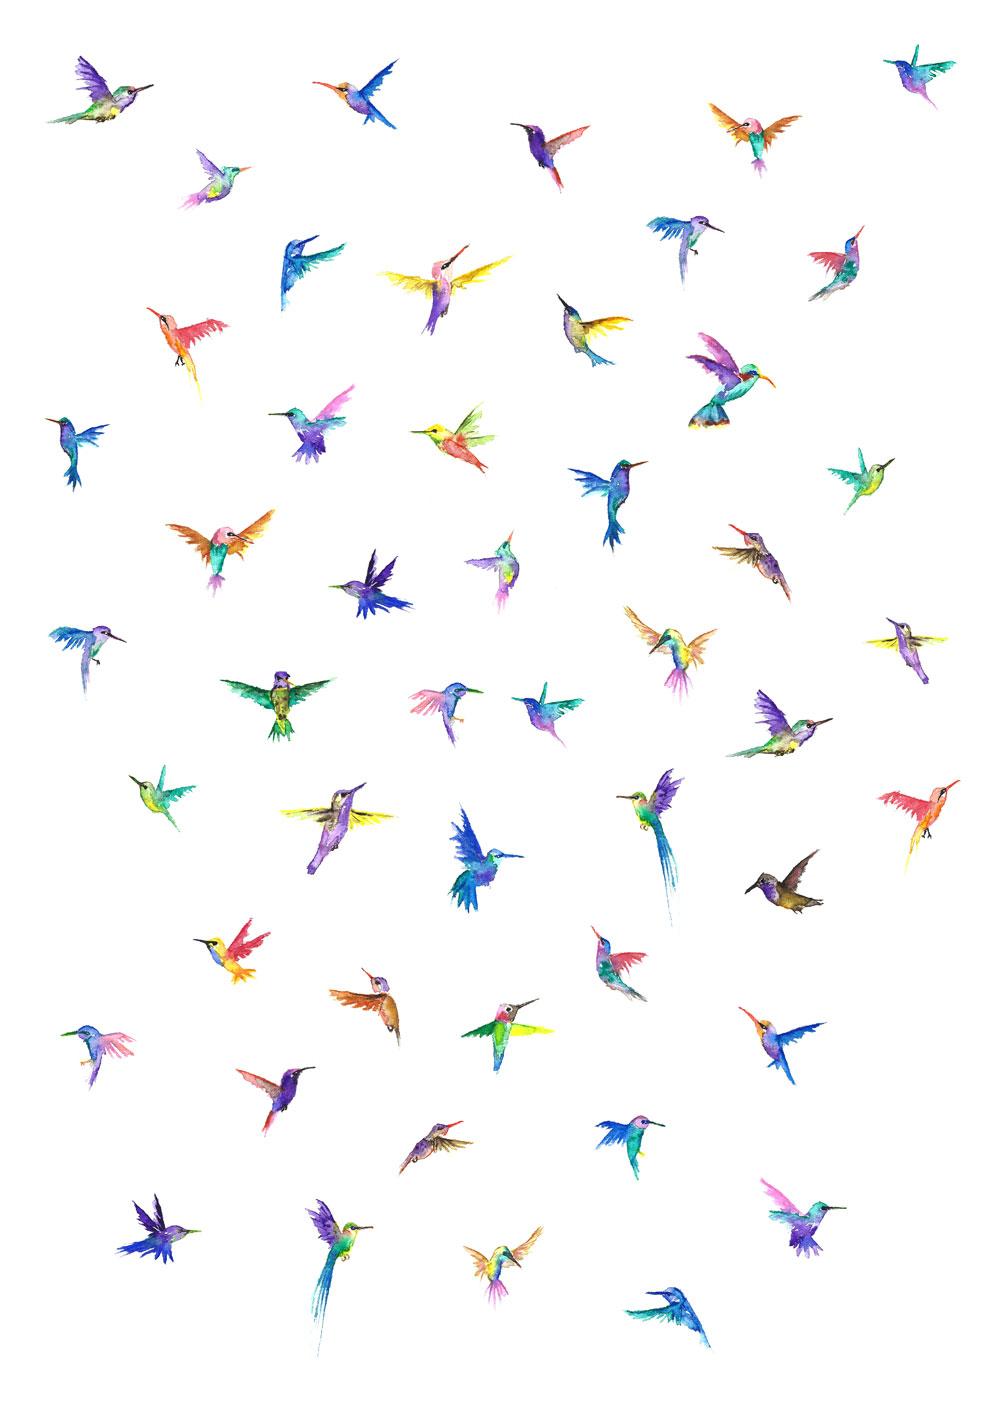 Hummingbirds part 1